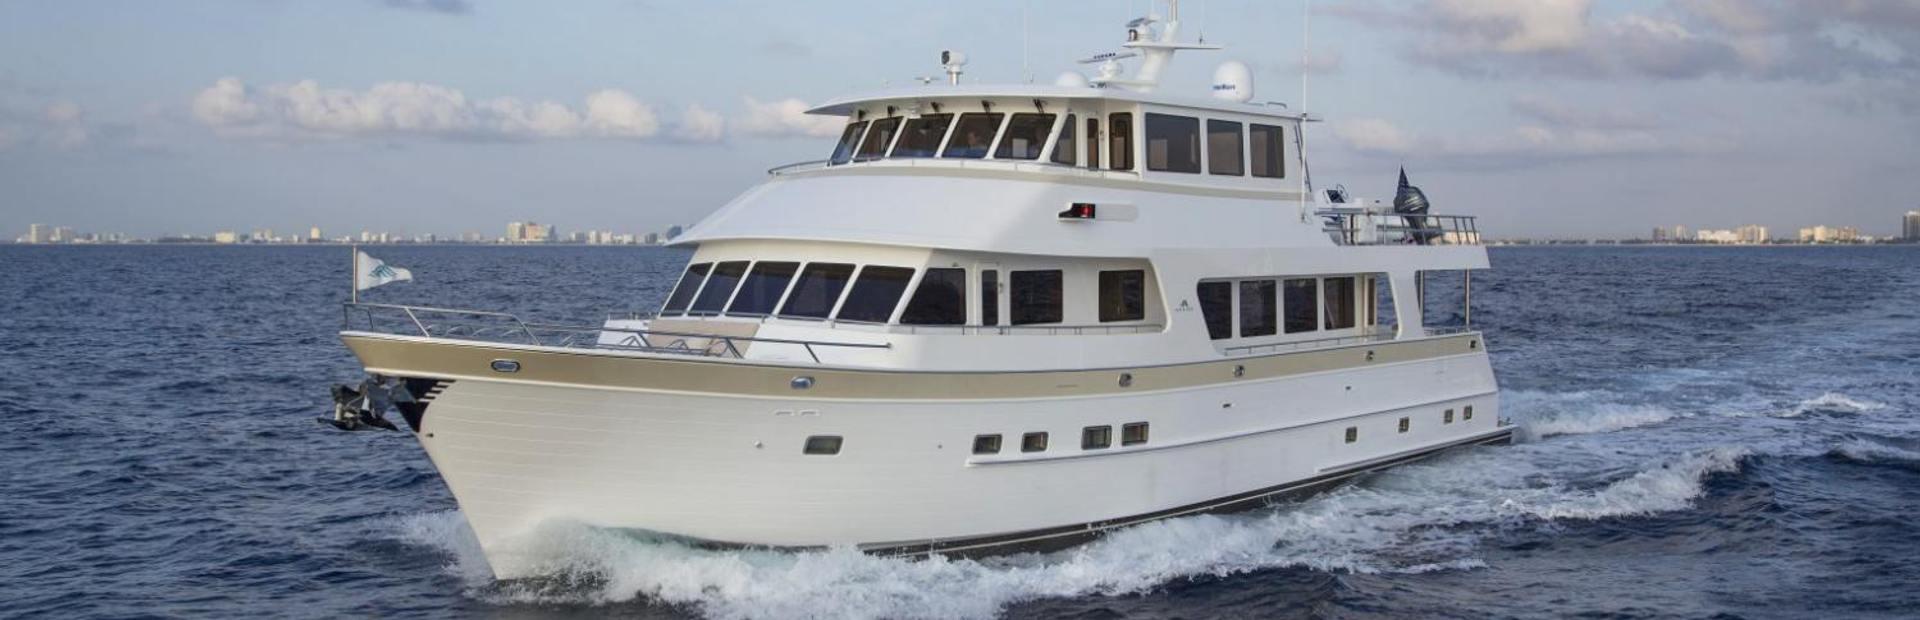 860 Deluxebridge Skylounge Motoryacht Yacht Charter